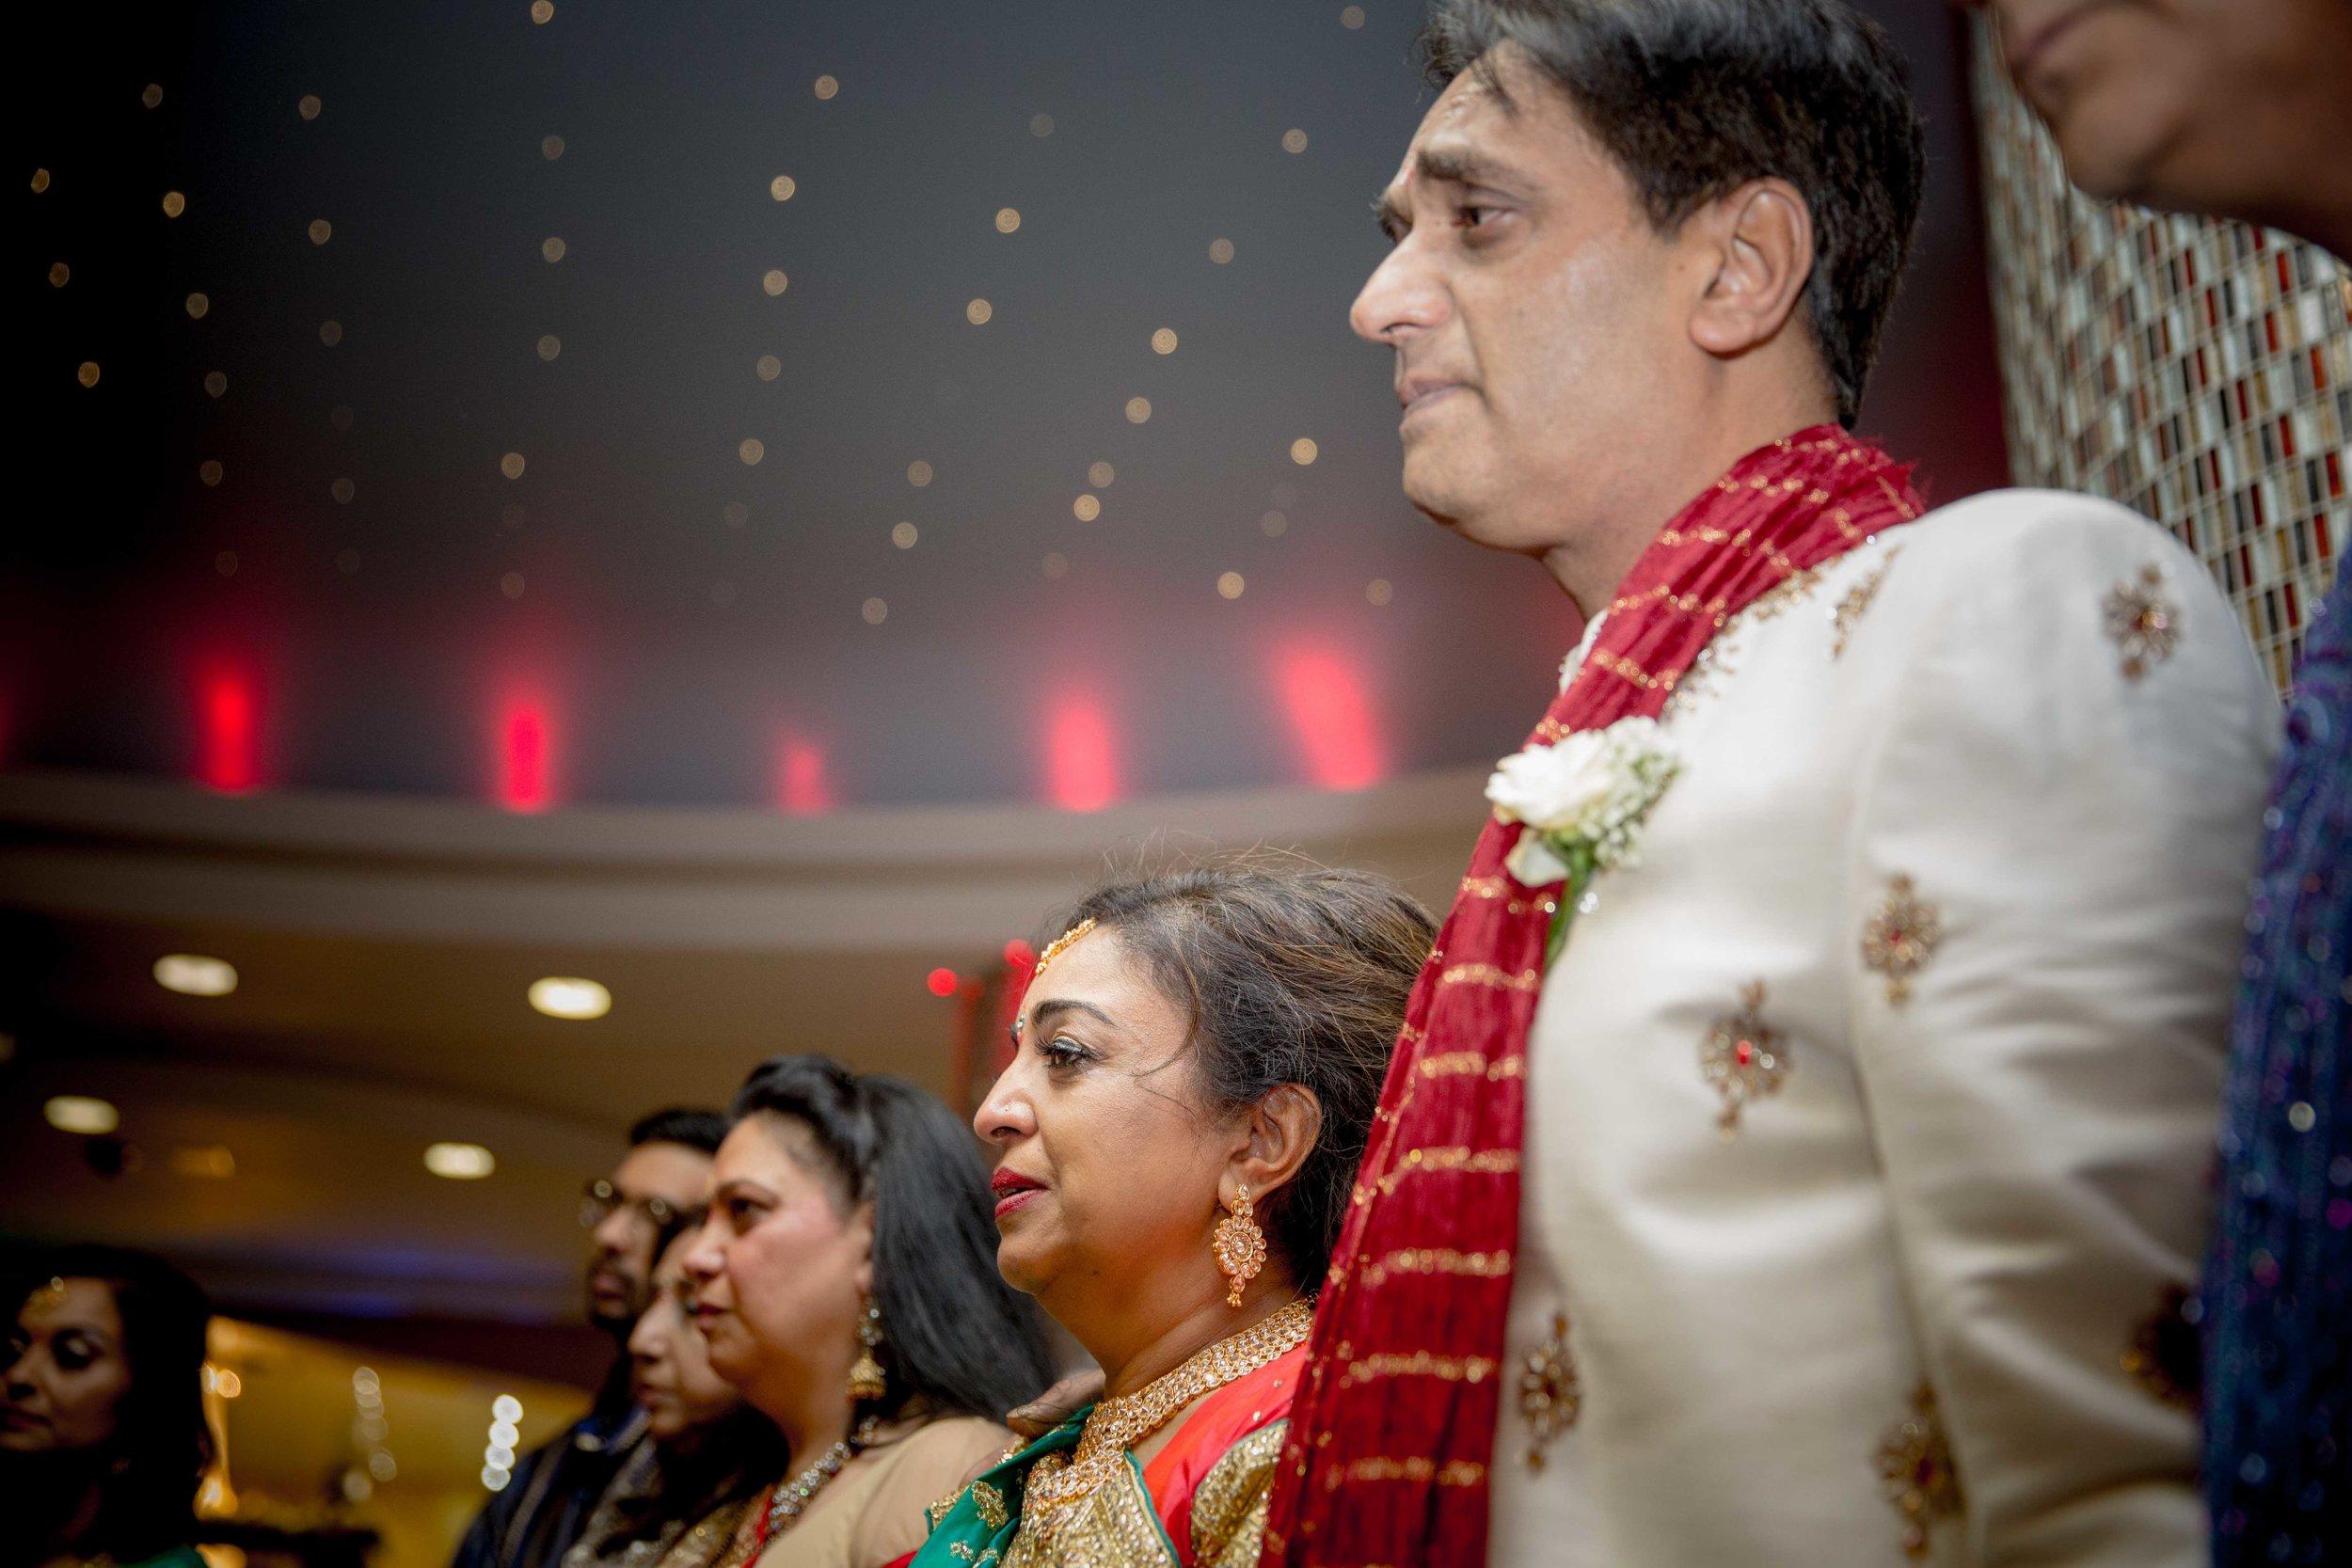 premier-banquetting-london-Hindu-asian-wedding-photographer-natalia-smith-photography-44.jpg